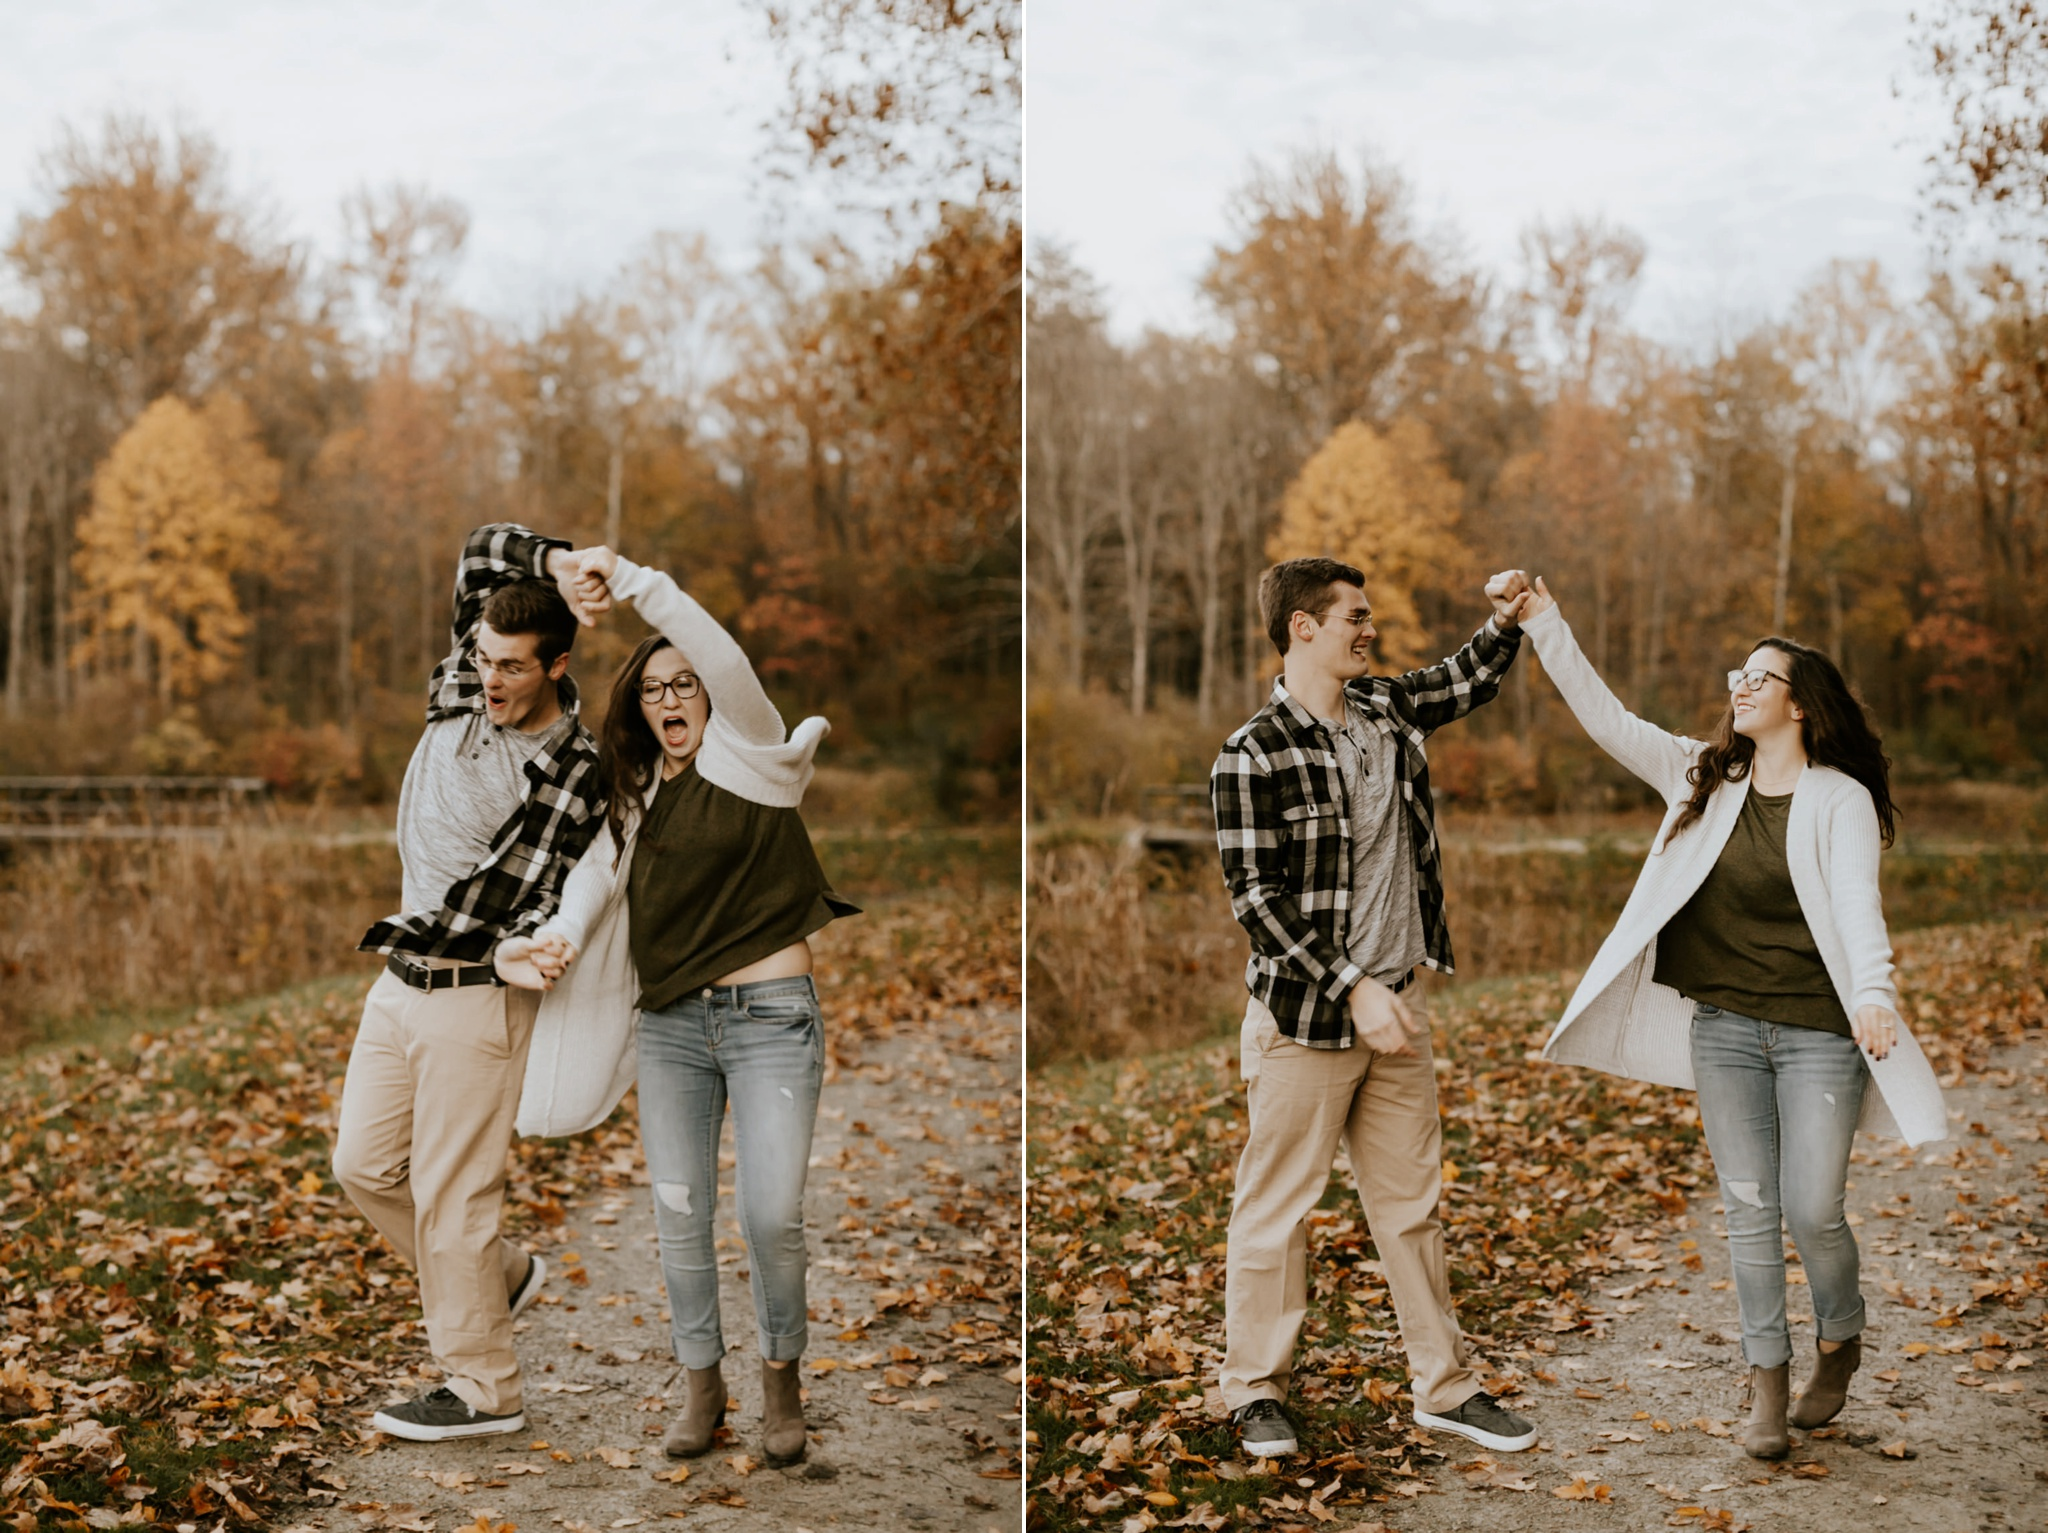 17-10-30 Lauren and Joe Engagement Edited-124_WEB.jpg